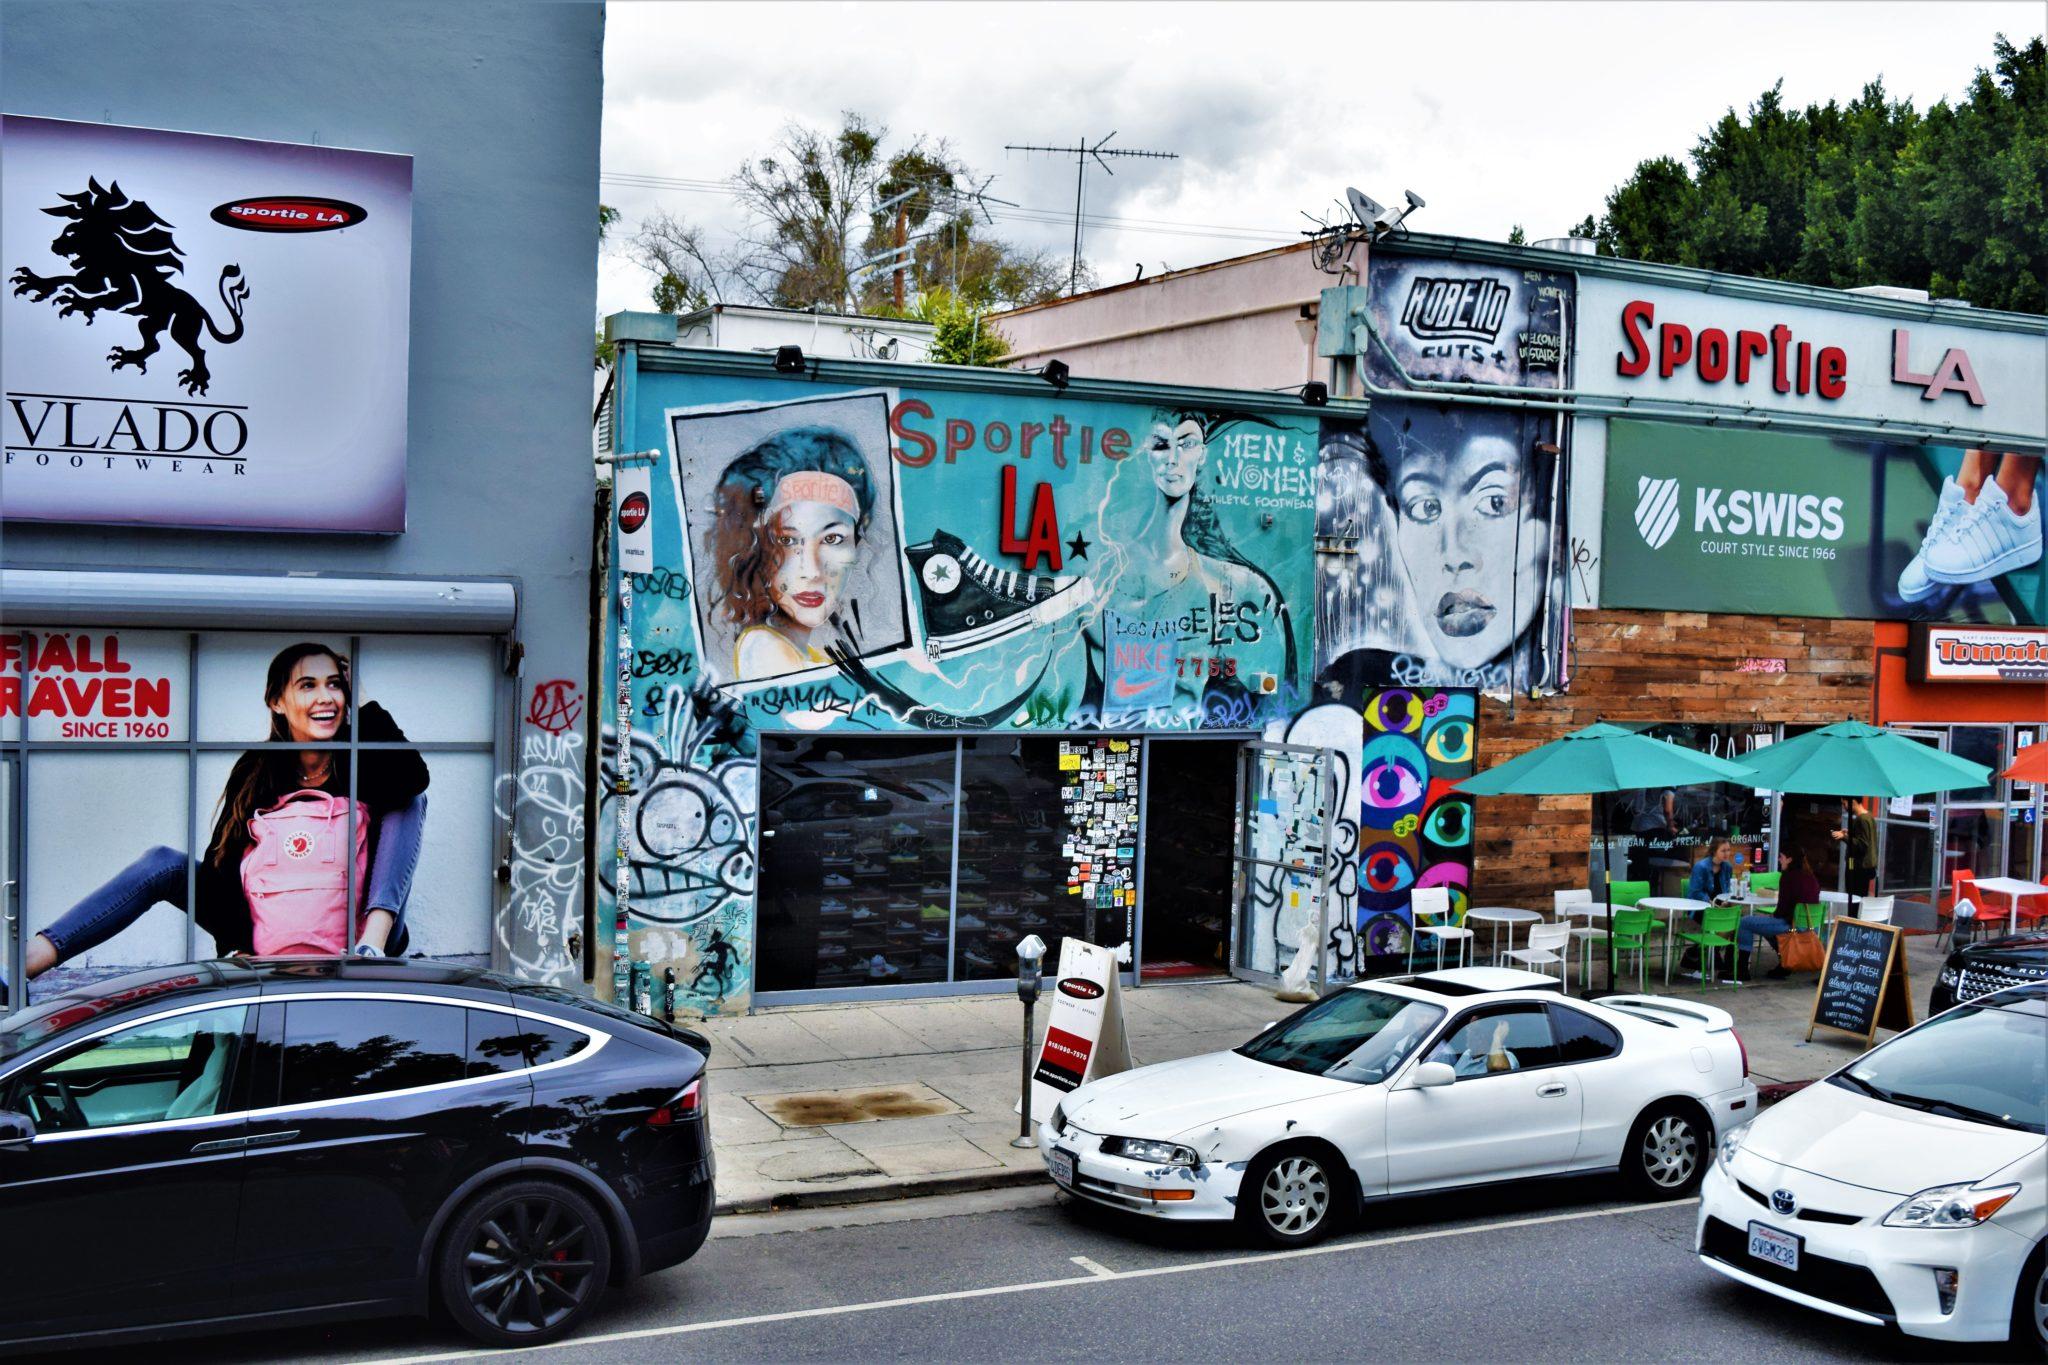 Sportie LA, Melrose Avenue, free things to do in los angeles